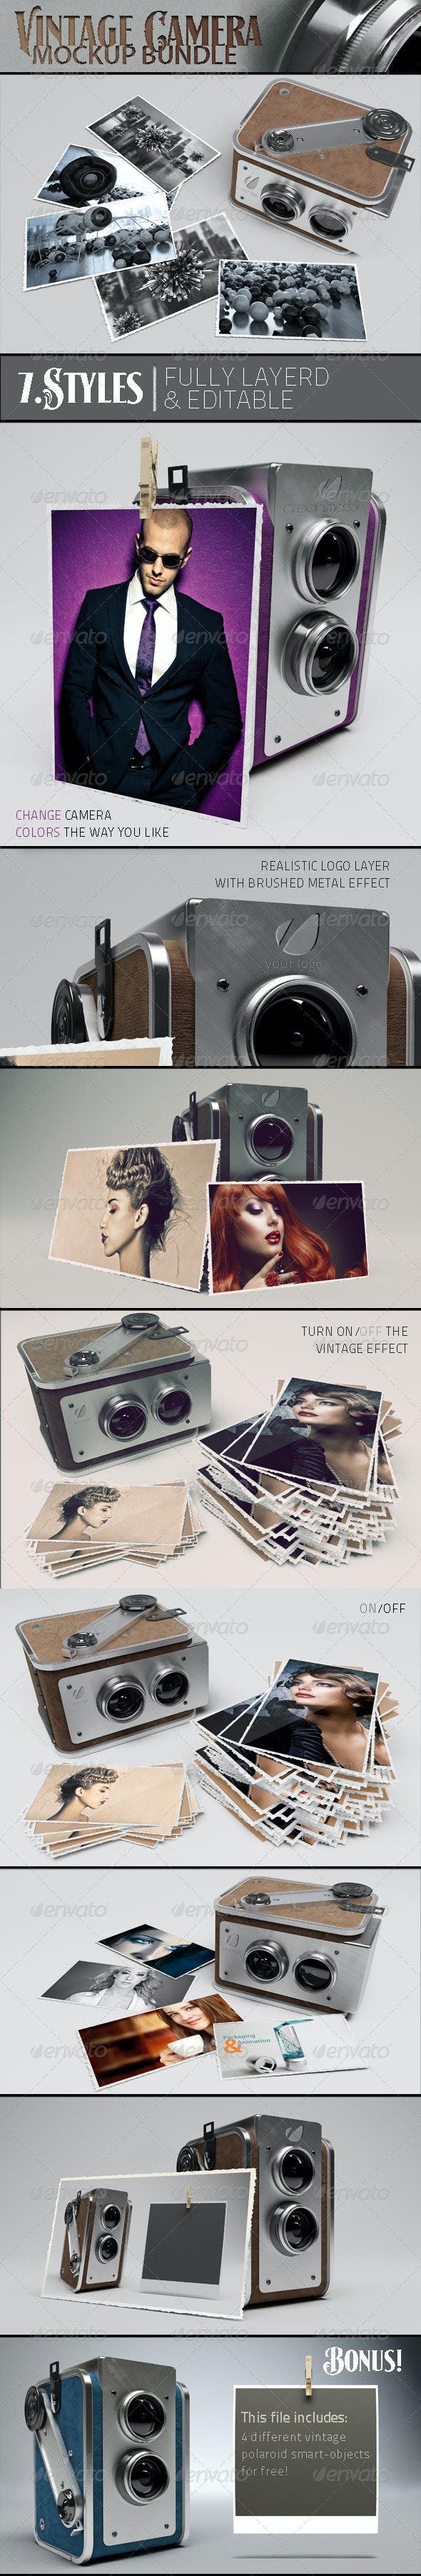 Vintage Camera Mockup - Miscellaneous Product Mock-Ups